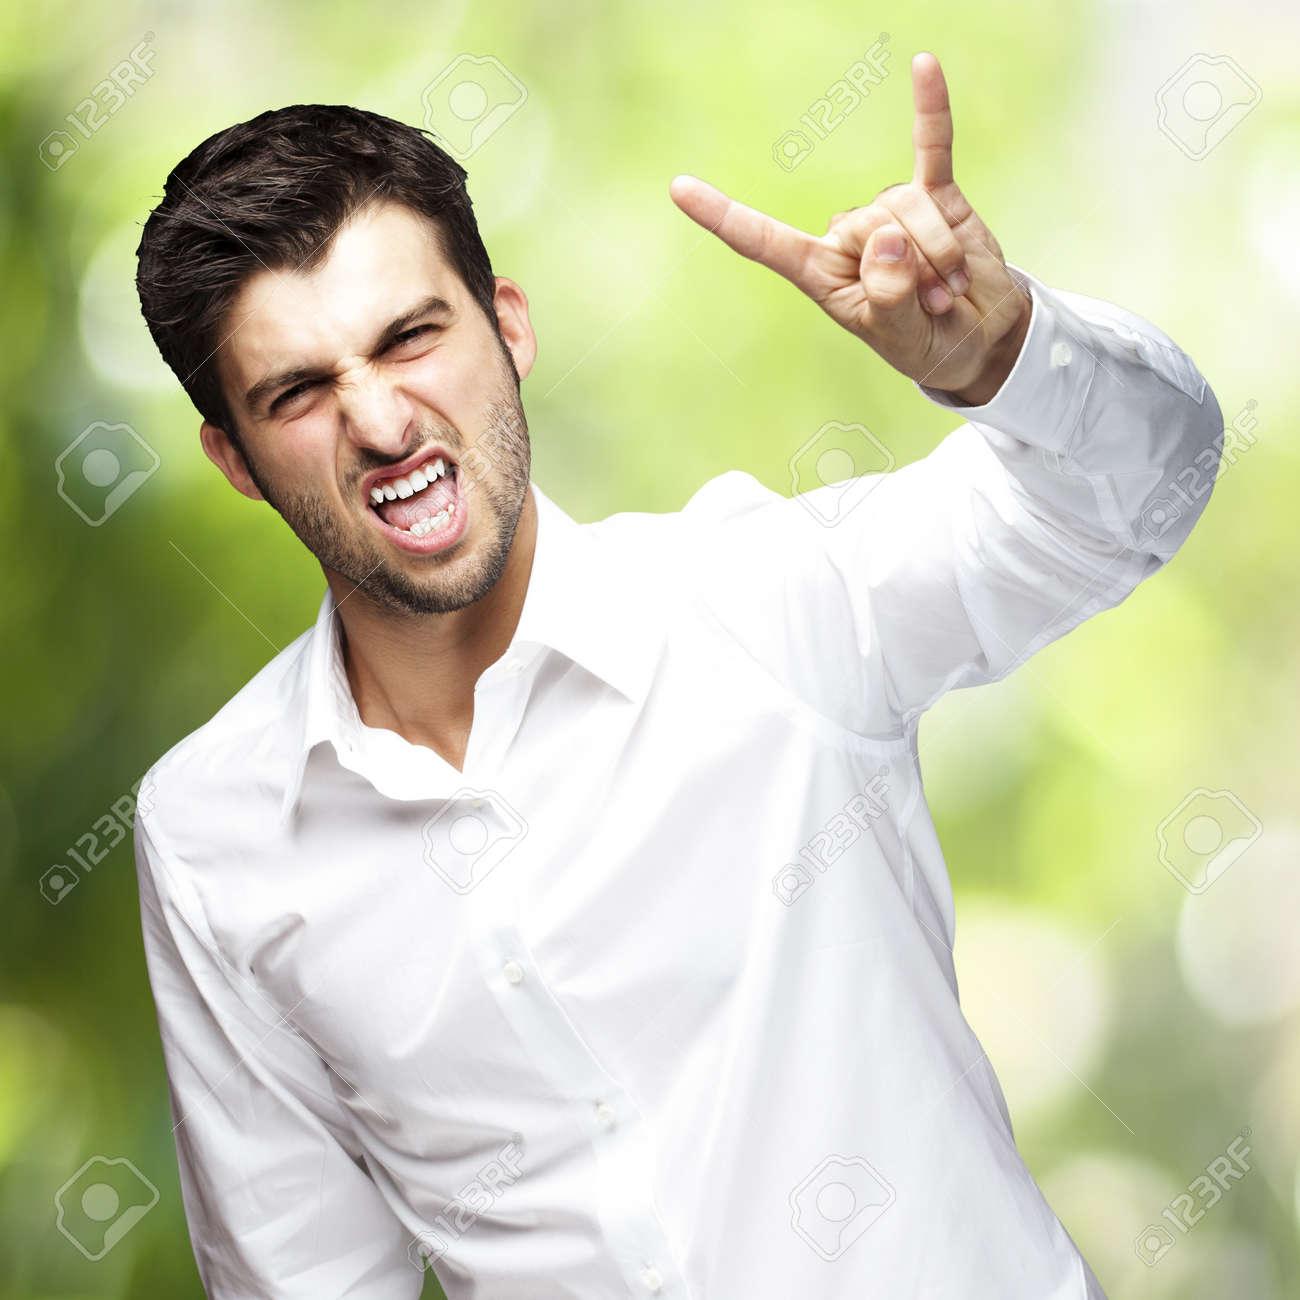 man doing rock gesture Stock Photo - 13486137